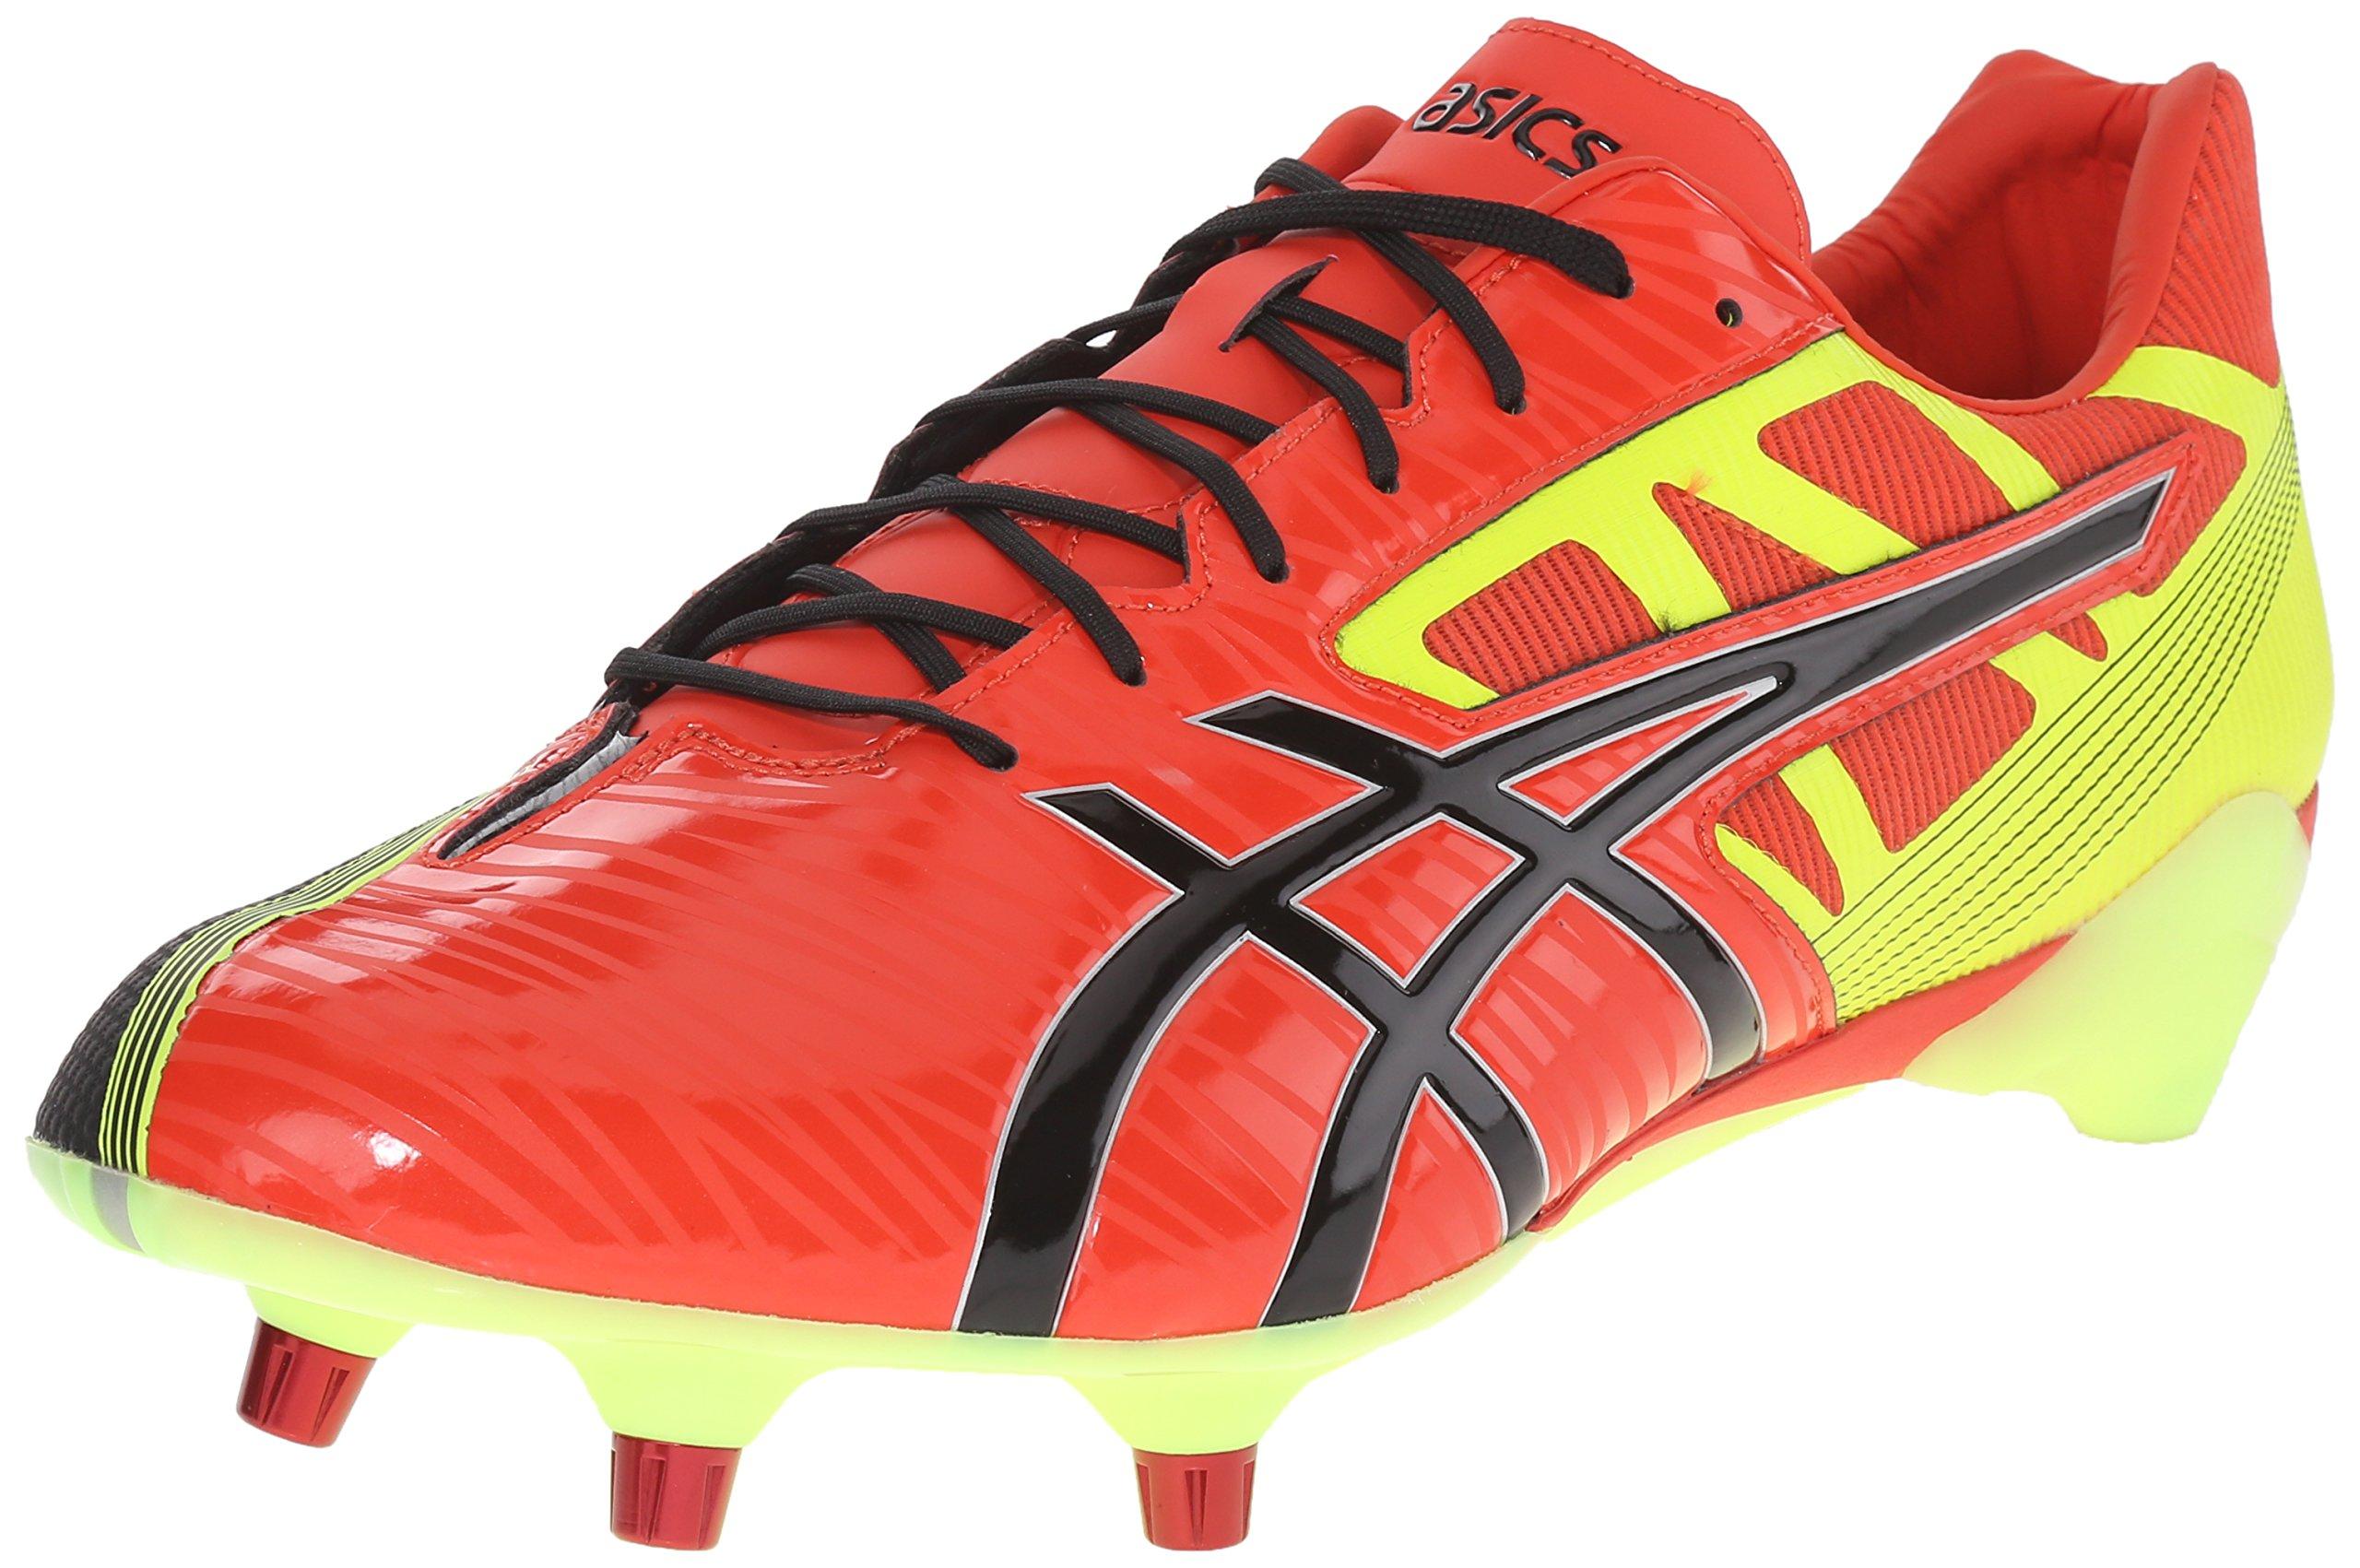 ASICS Men's GEL-Lethal Speed Deep Orange/Black/Flash Yellow Rugby Shoe - 7.5 D(M) US by ASICS